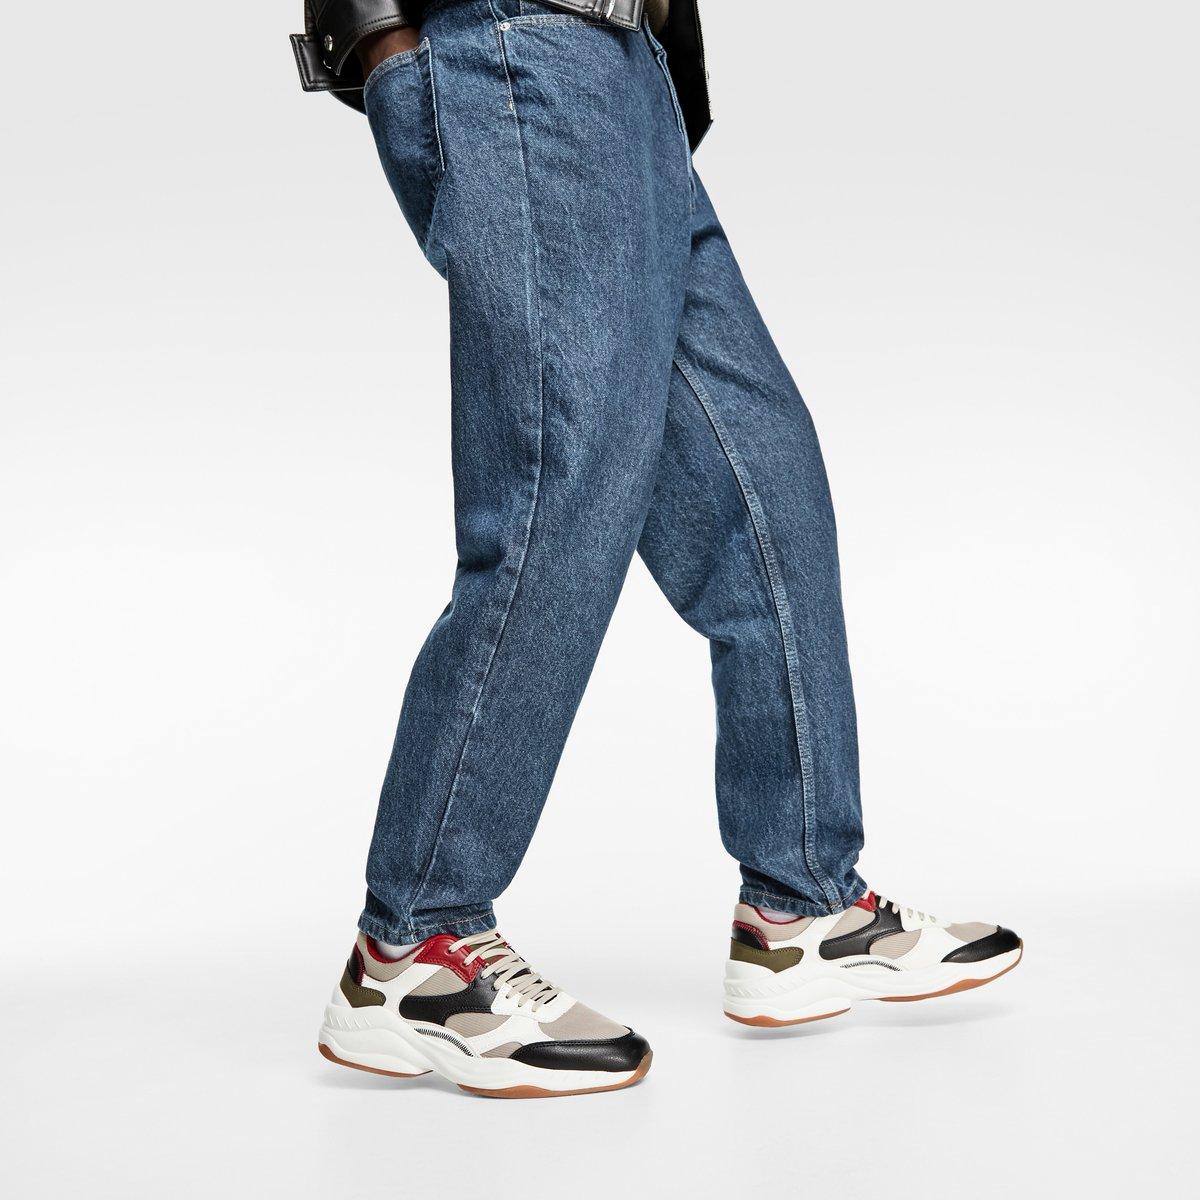 zaranewin | Chunky sole sneakers